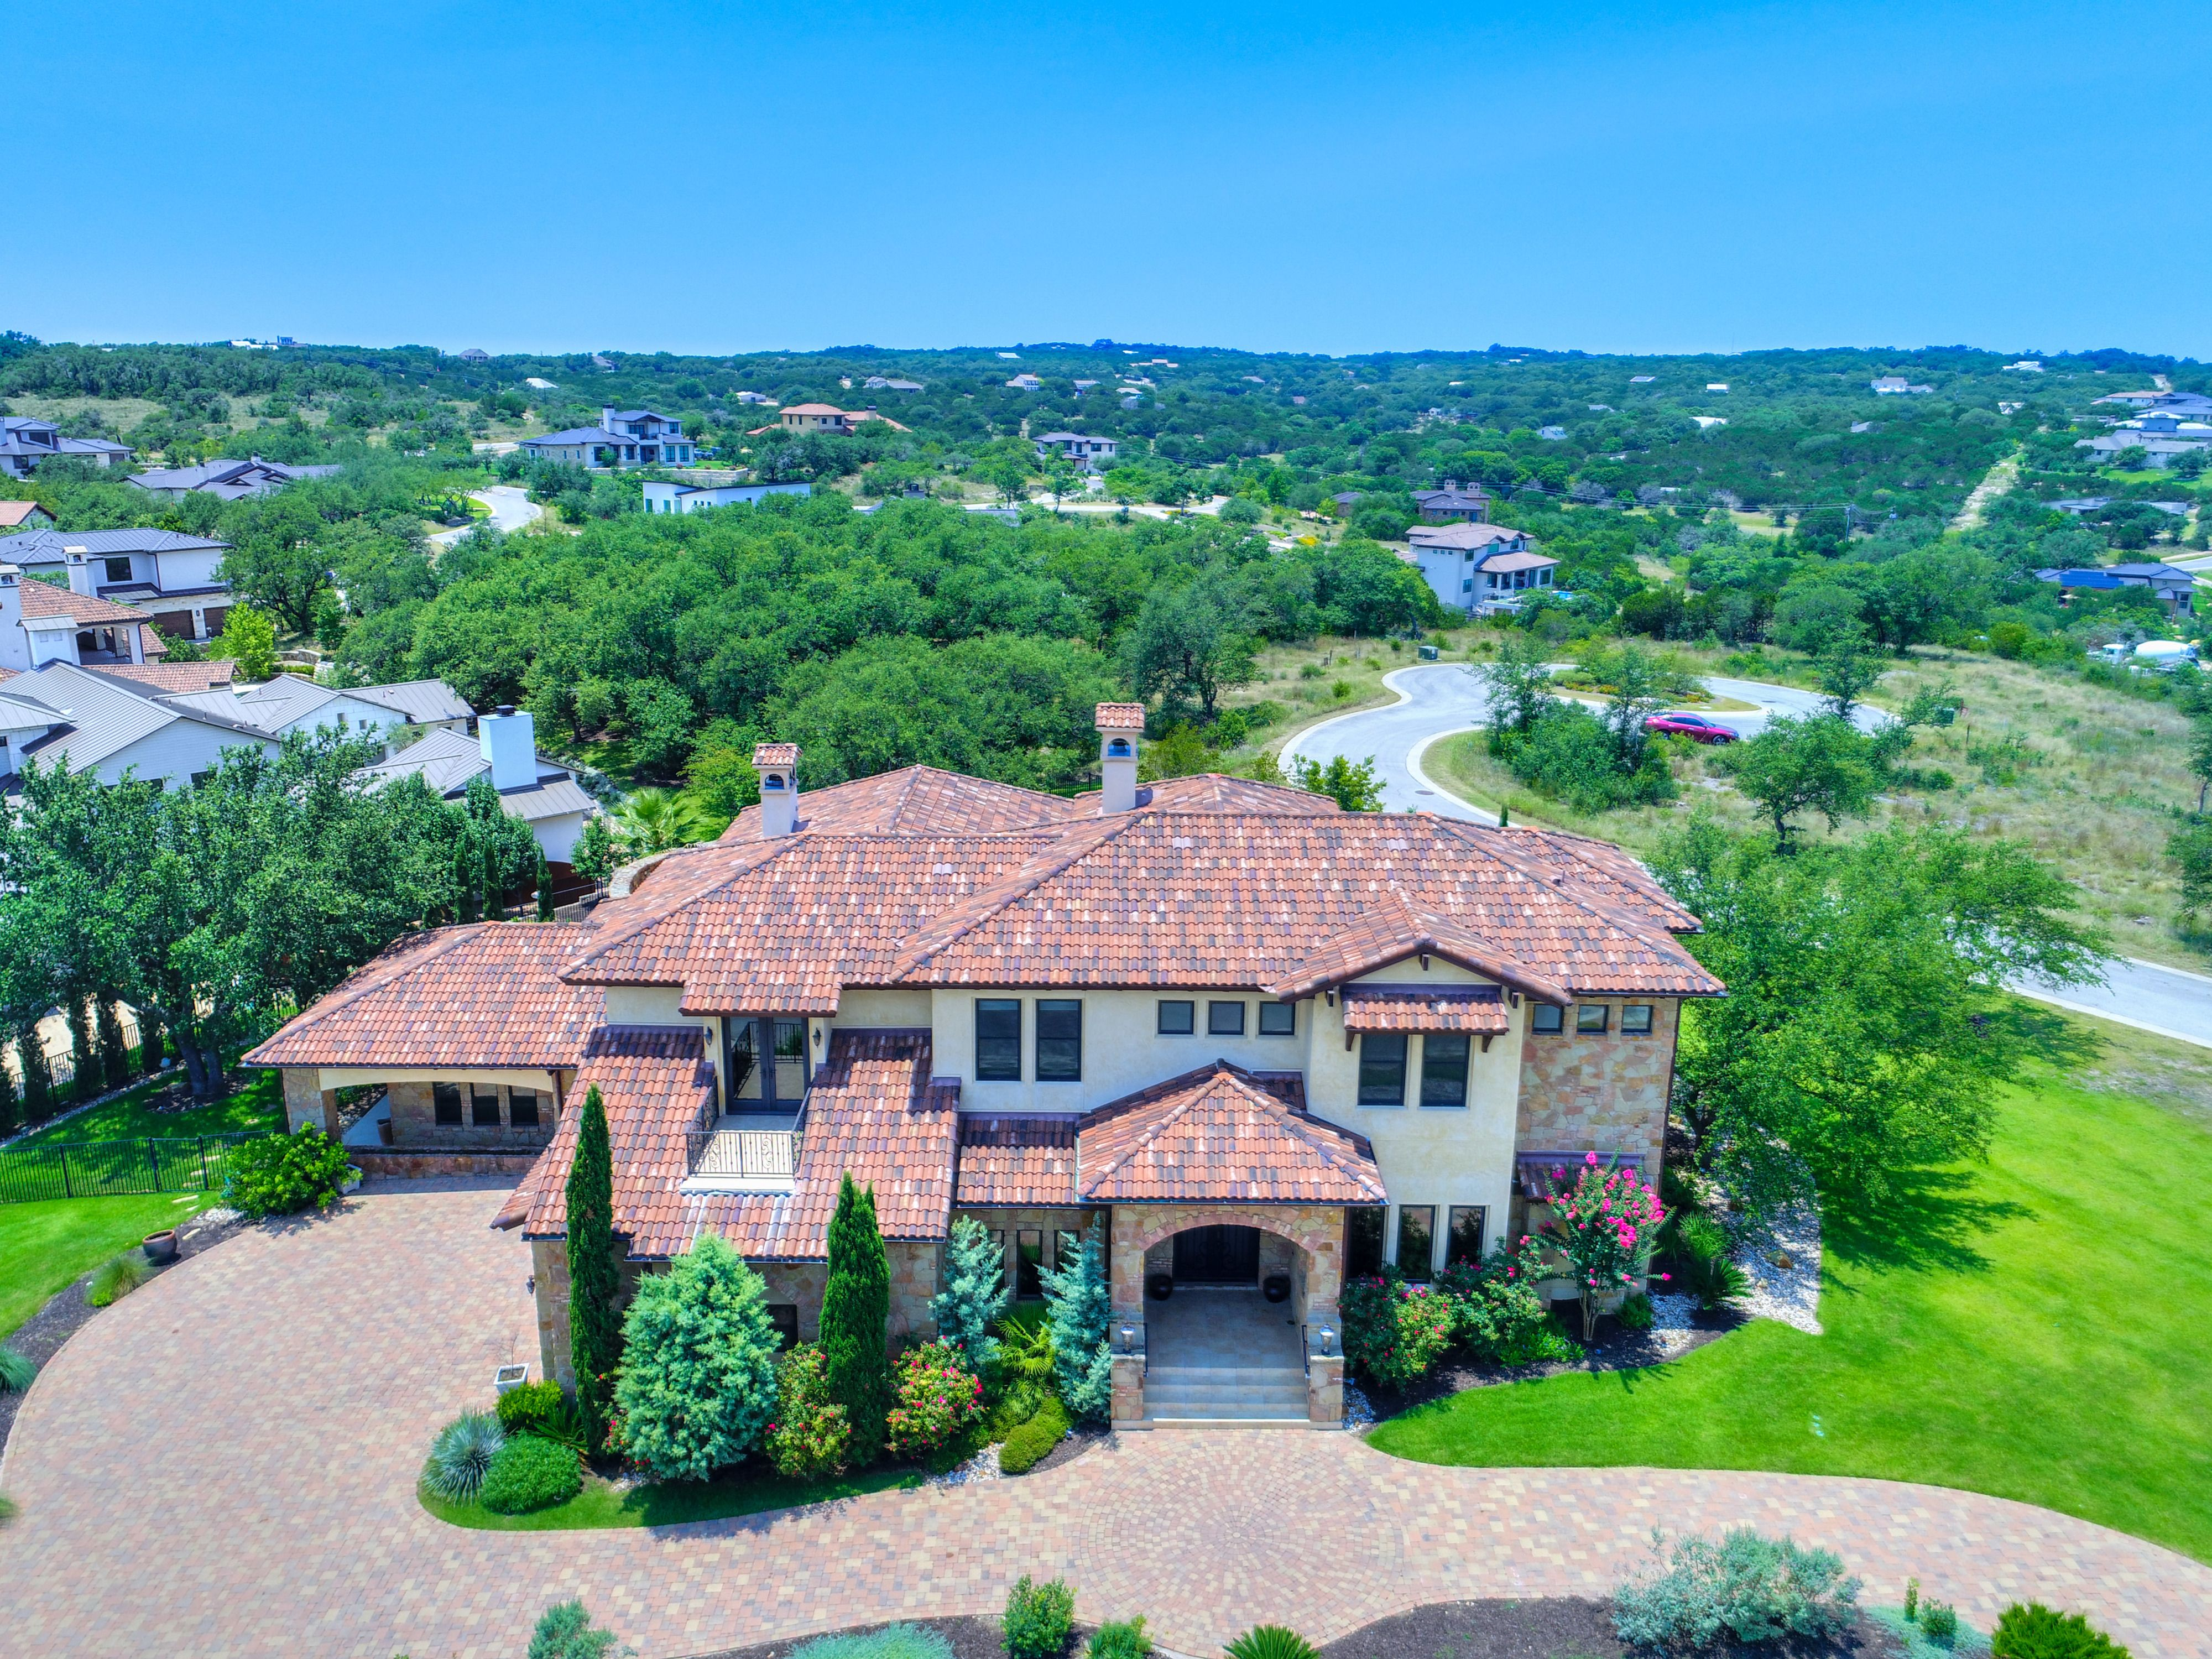 12601 Maidenhair Lane In The Upscale Gated Golf Community, Spanish Oaks.  $1,973,000